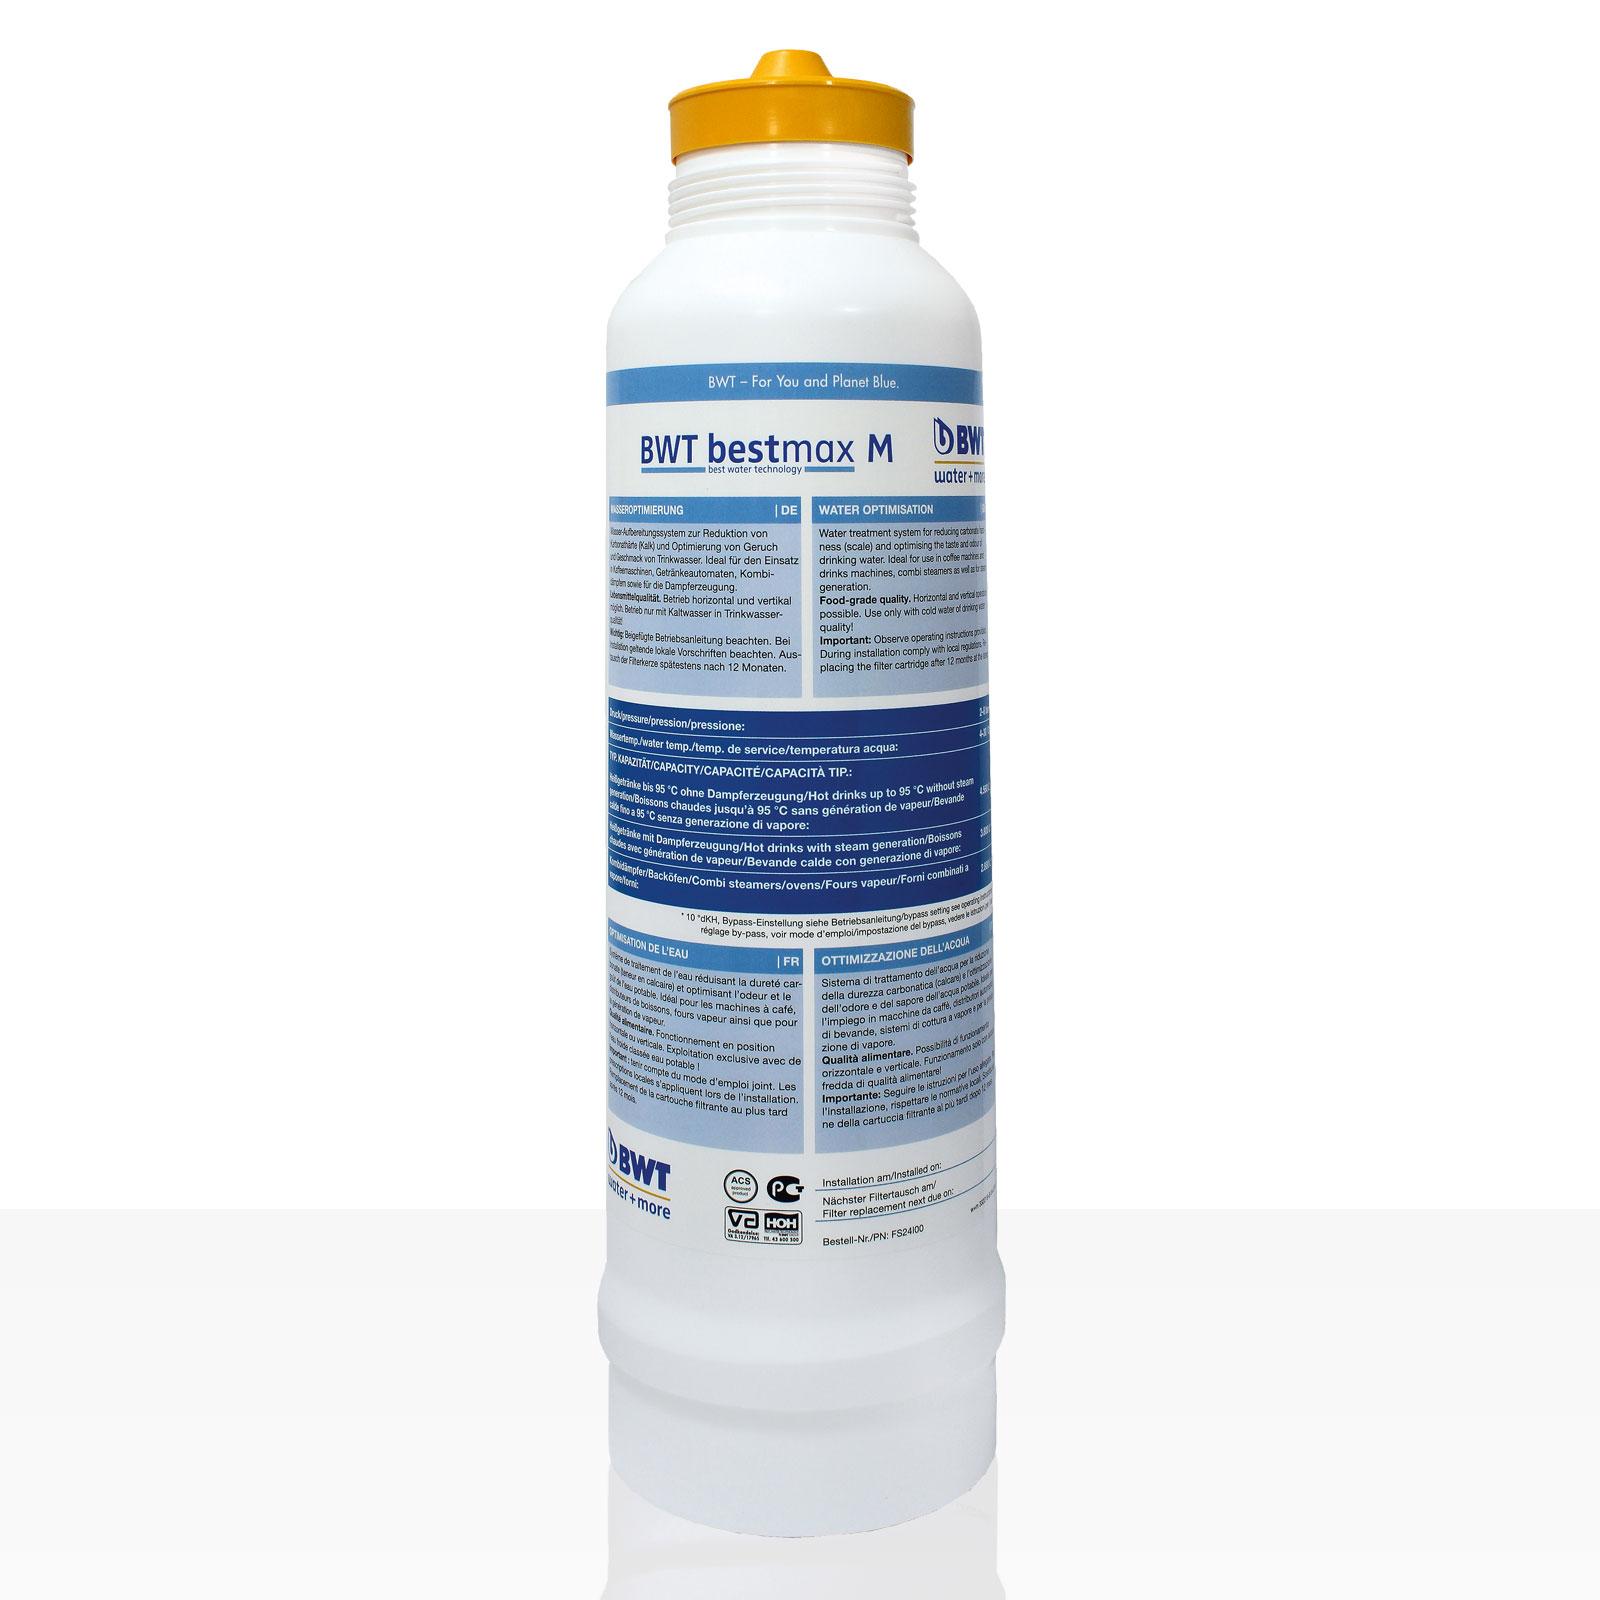 Bestmax M Filterkerze, BWT water + more Wasserfilter ca. 3800 L